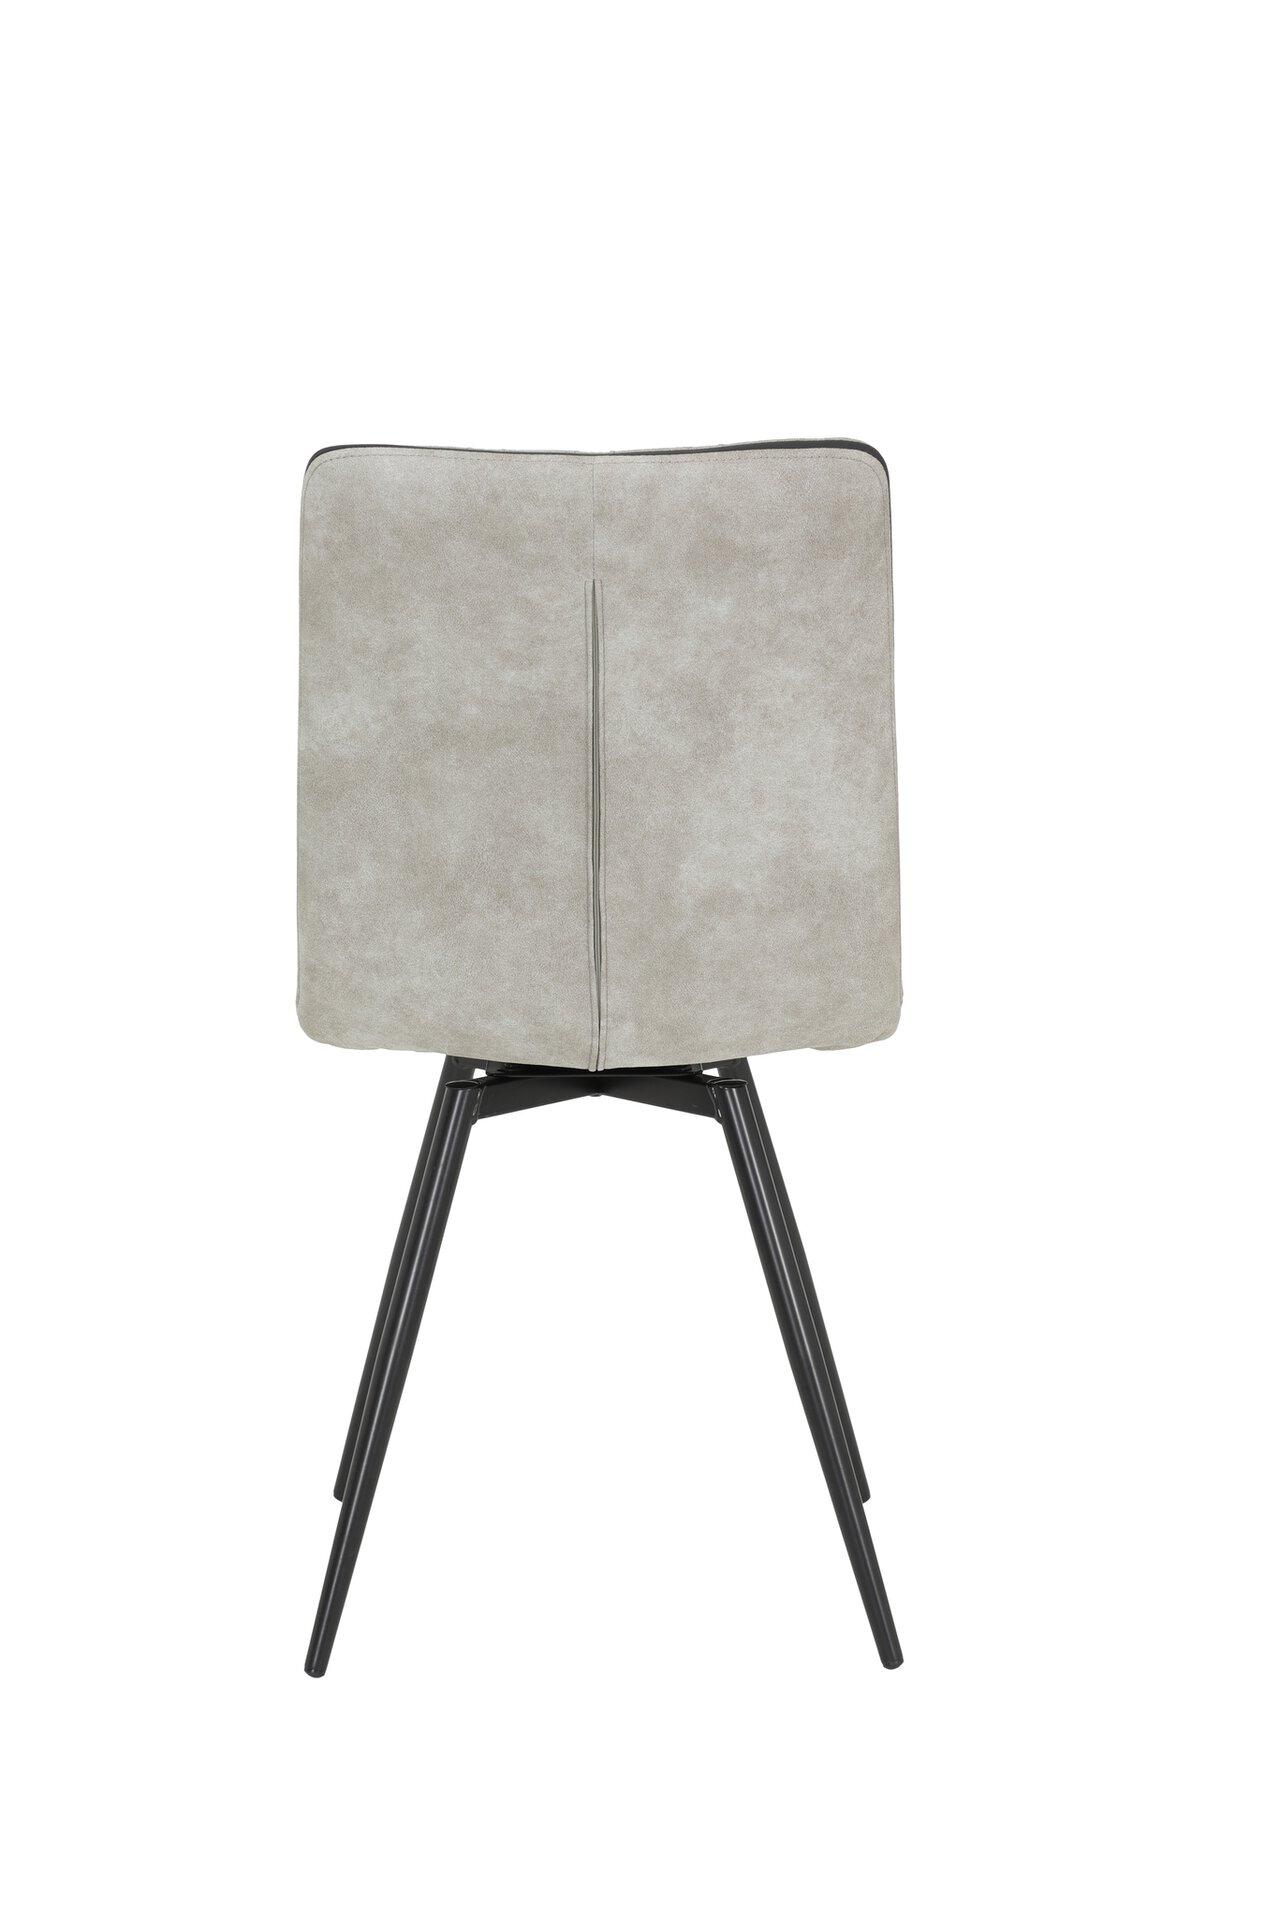 4-Fuß-Stuhl Aileen S SELF Textil 59 x 90 x 45 cm